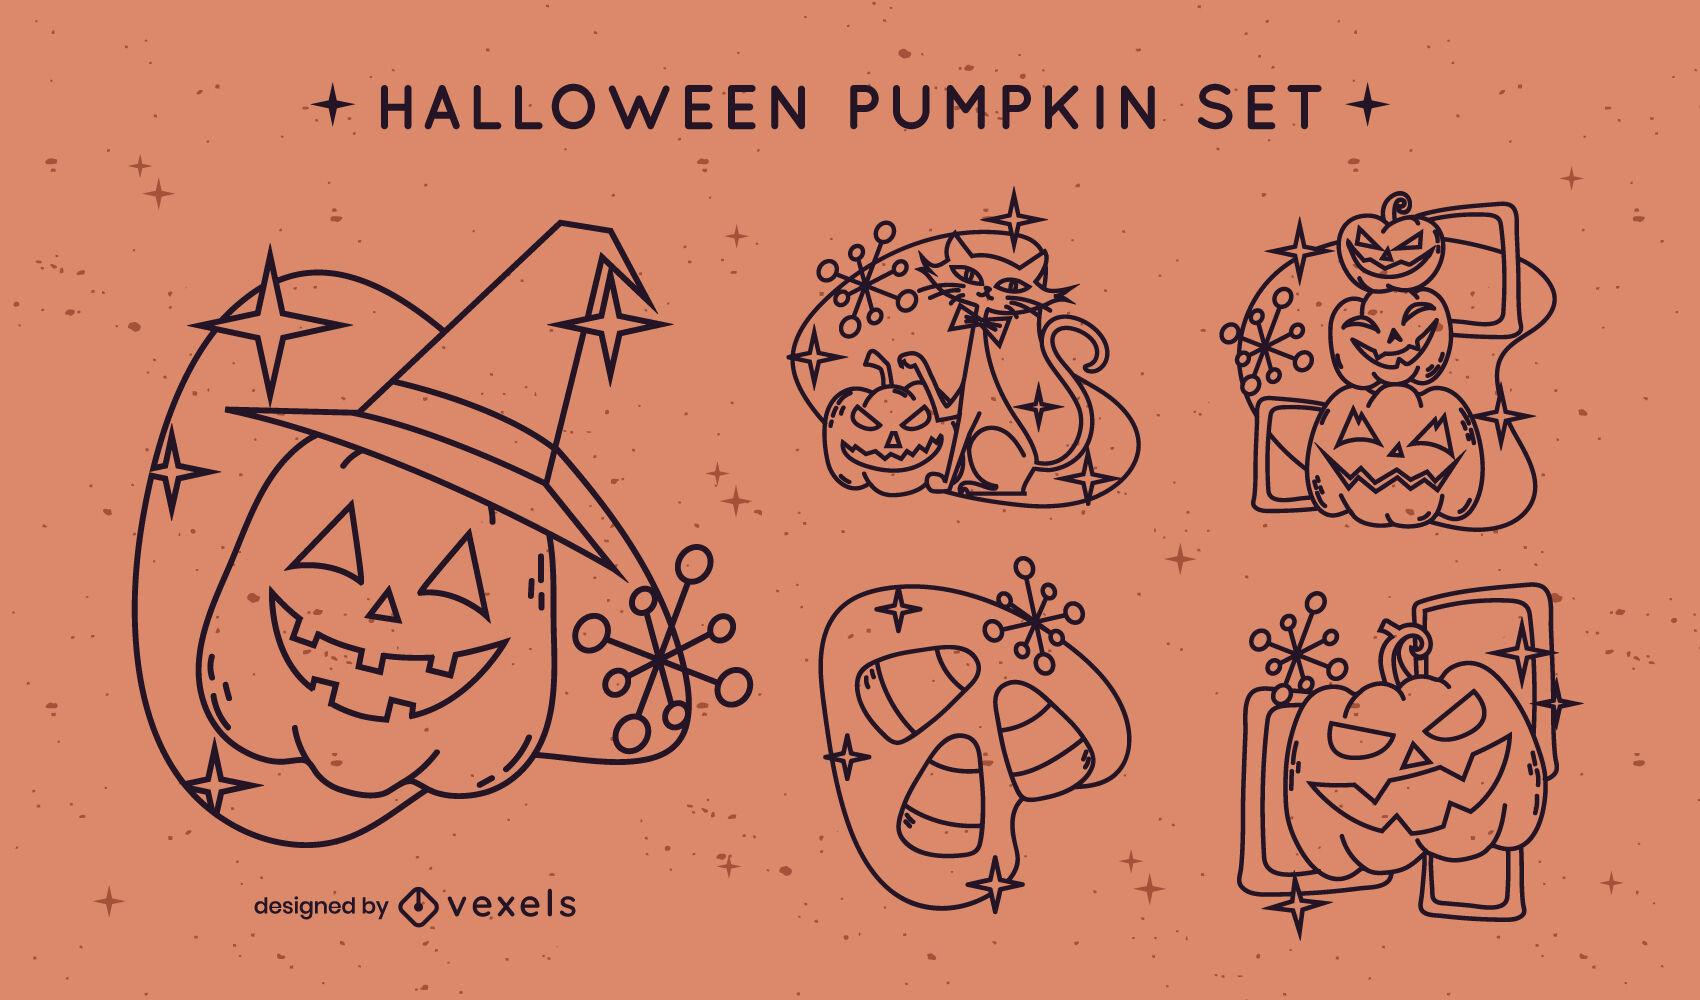 Halloween holiday pumpkins strok set